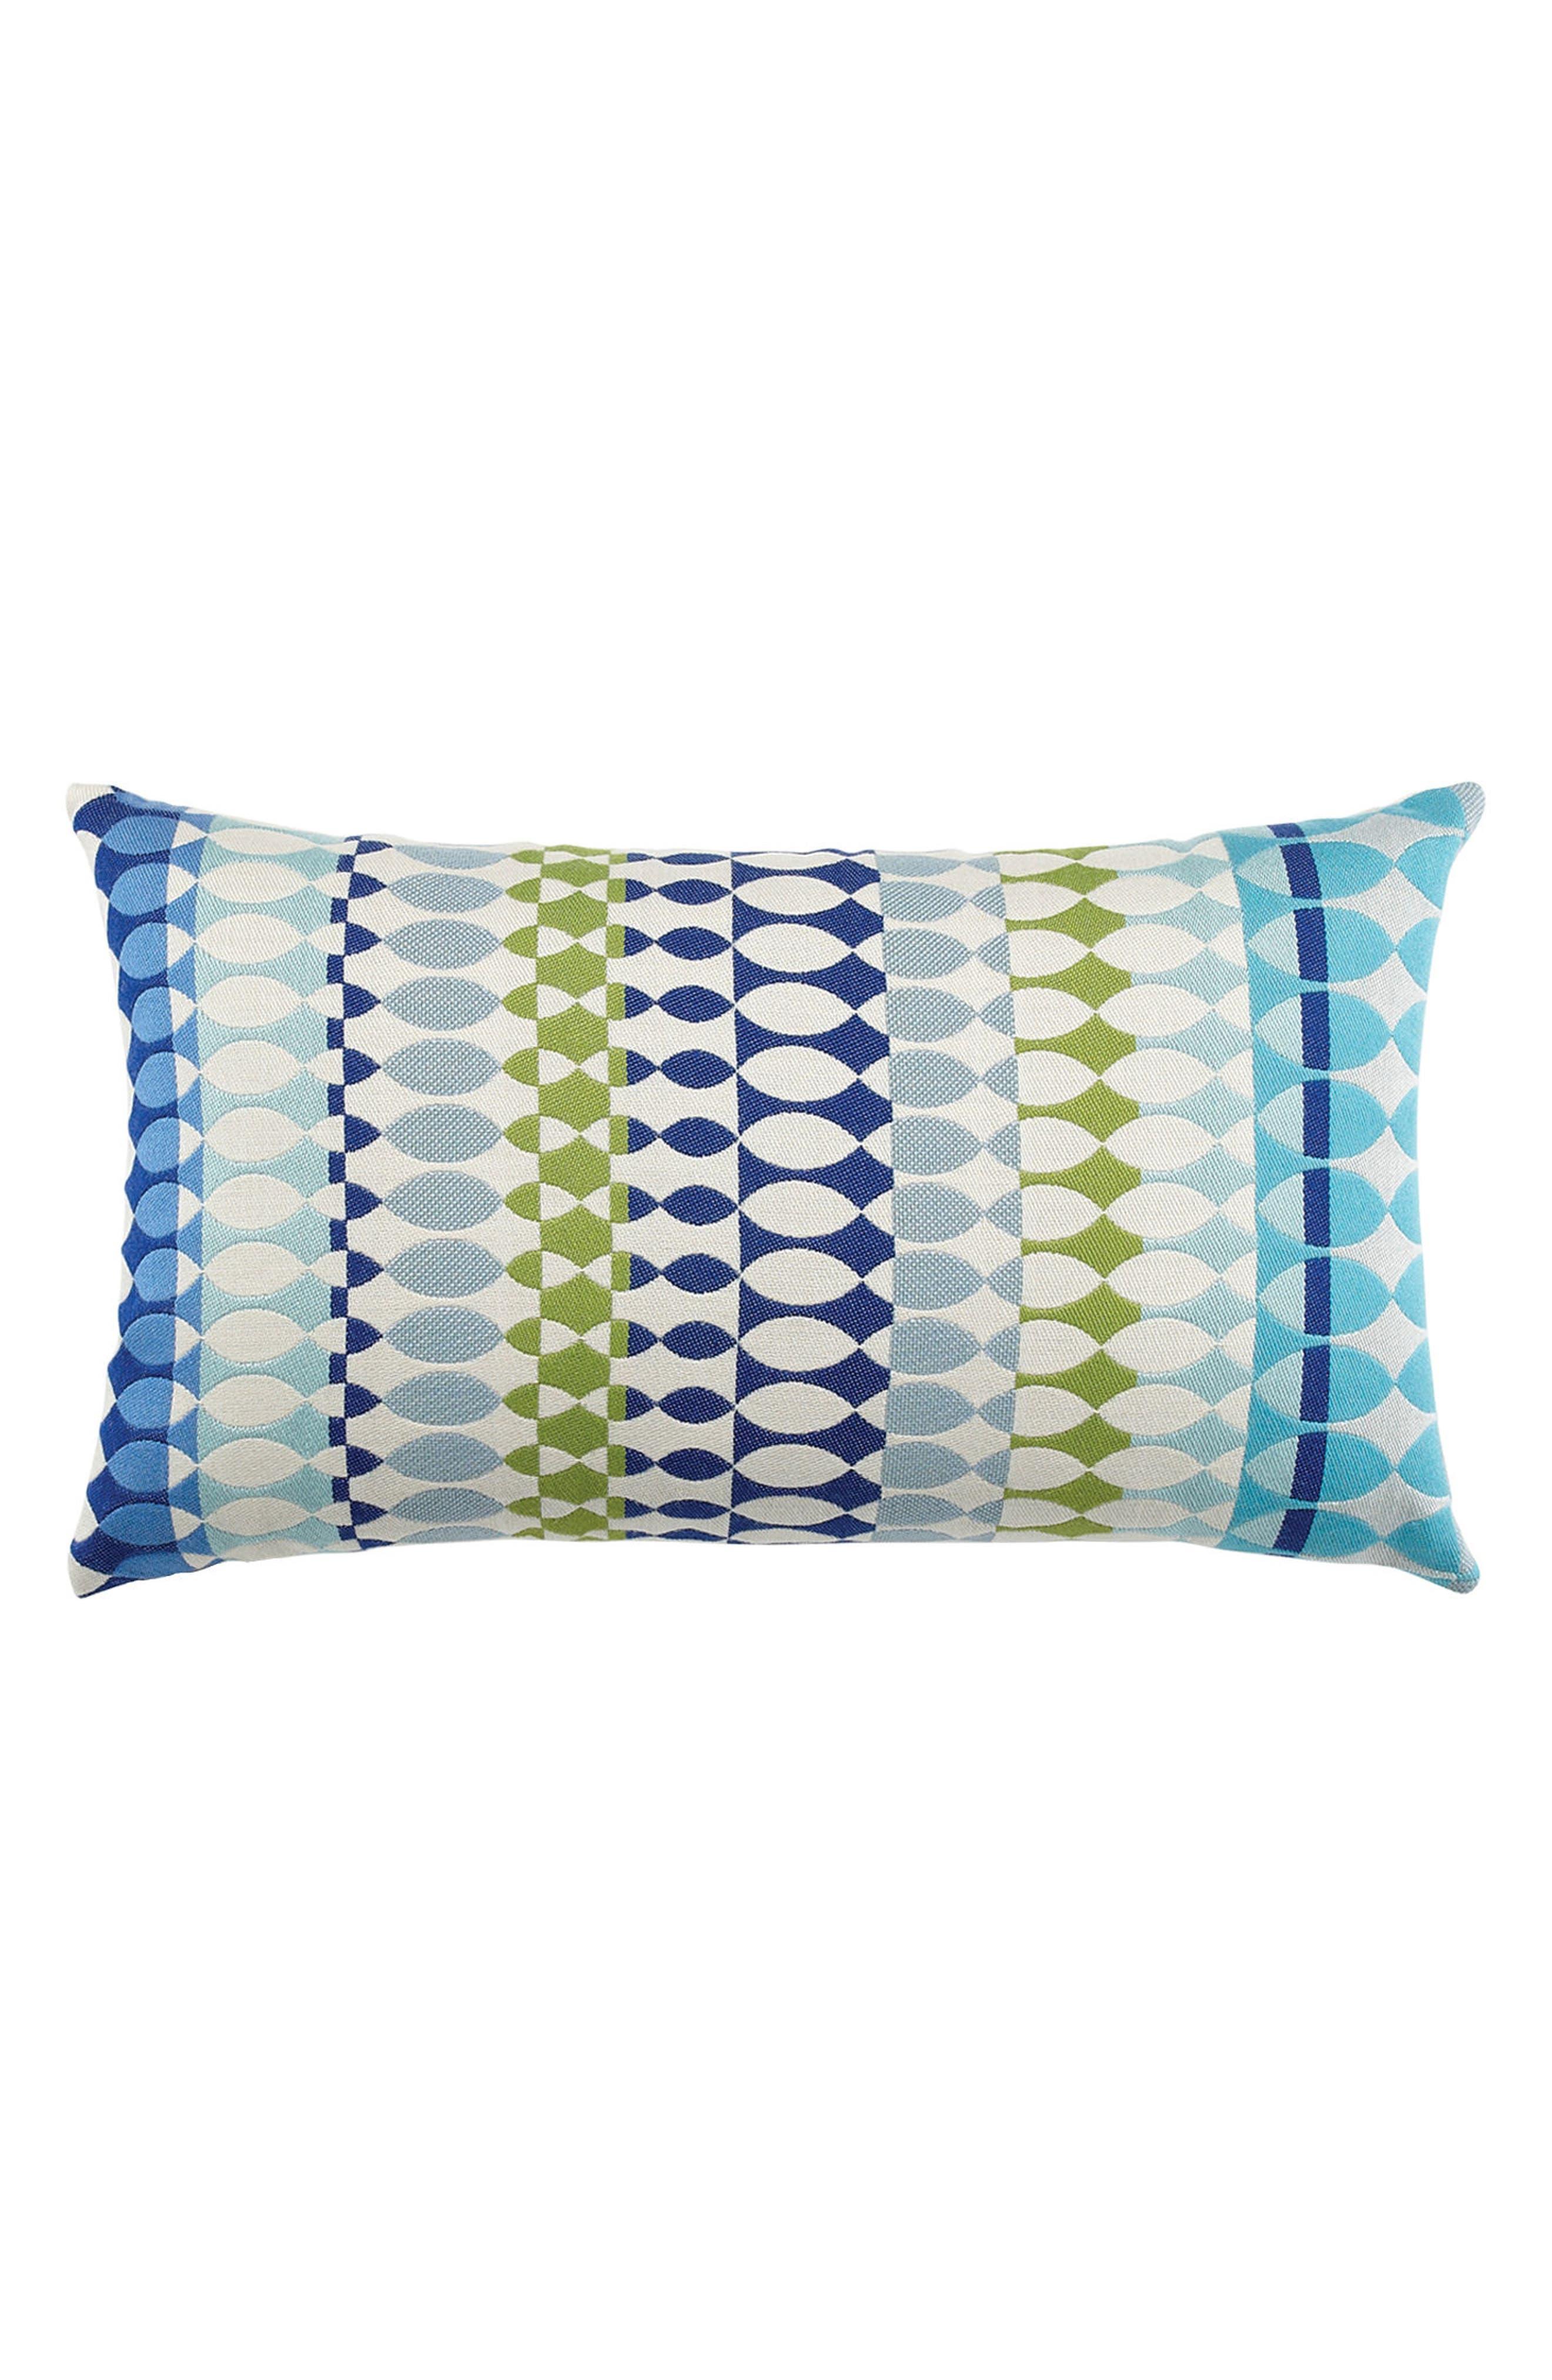 ELAINE SMITH Modern Oval Ocean Lumbar Pillow, Main, color, 400